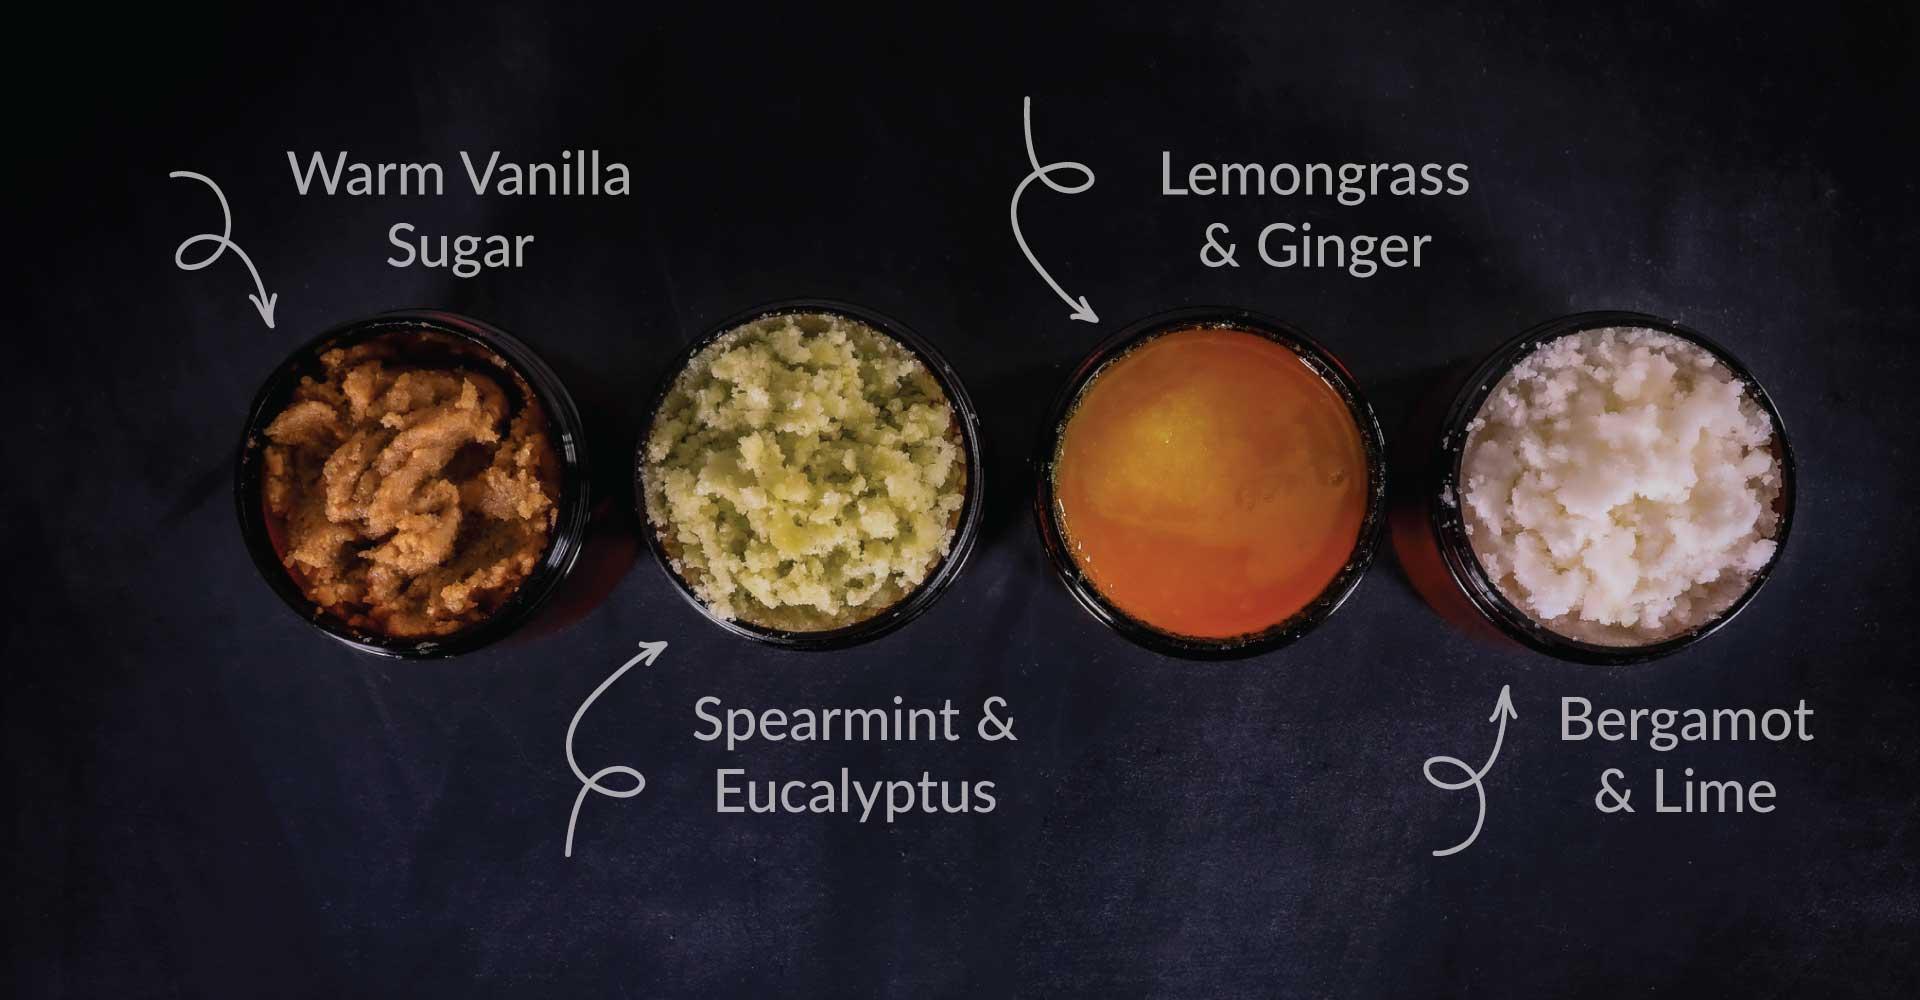 4 DIY Sugar Scrubs, Warm Vanilla Sugar, Spearmint and Eucalyptus, Lemongrass and Ginger, Bergamot and Lime